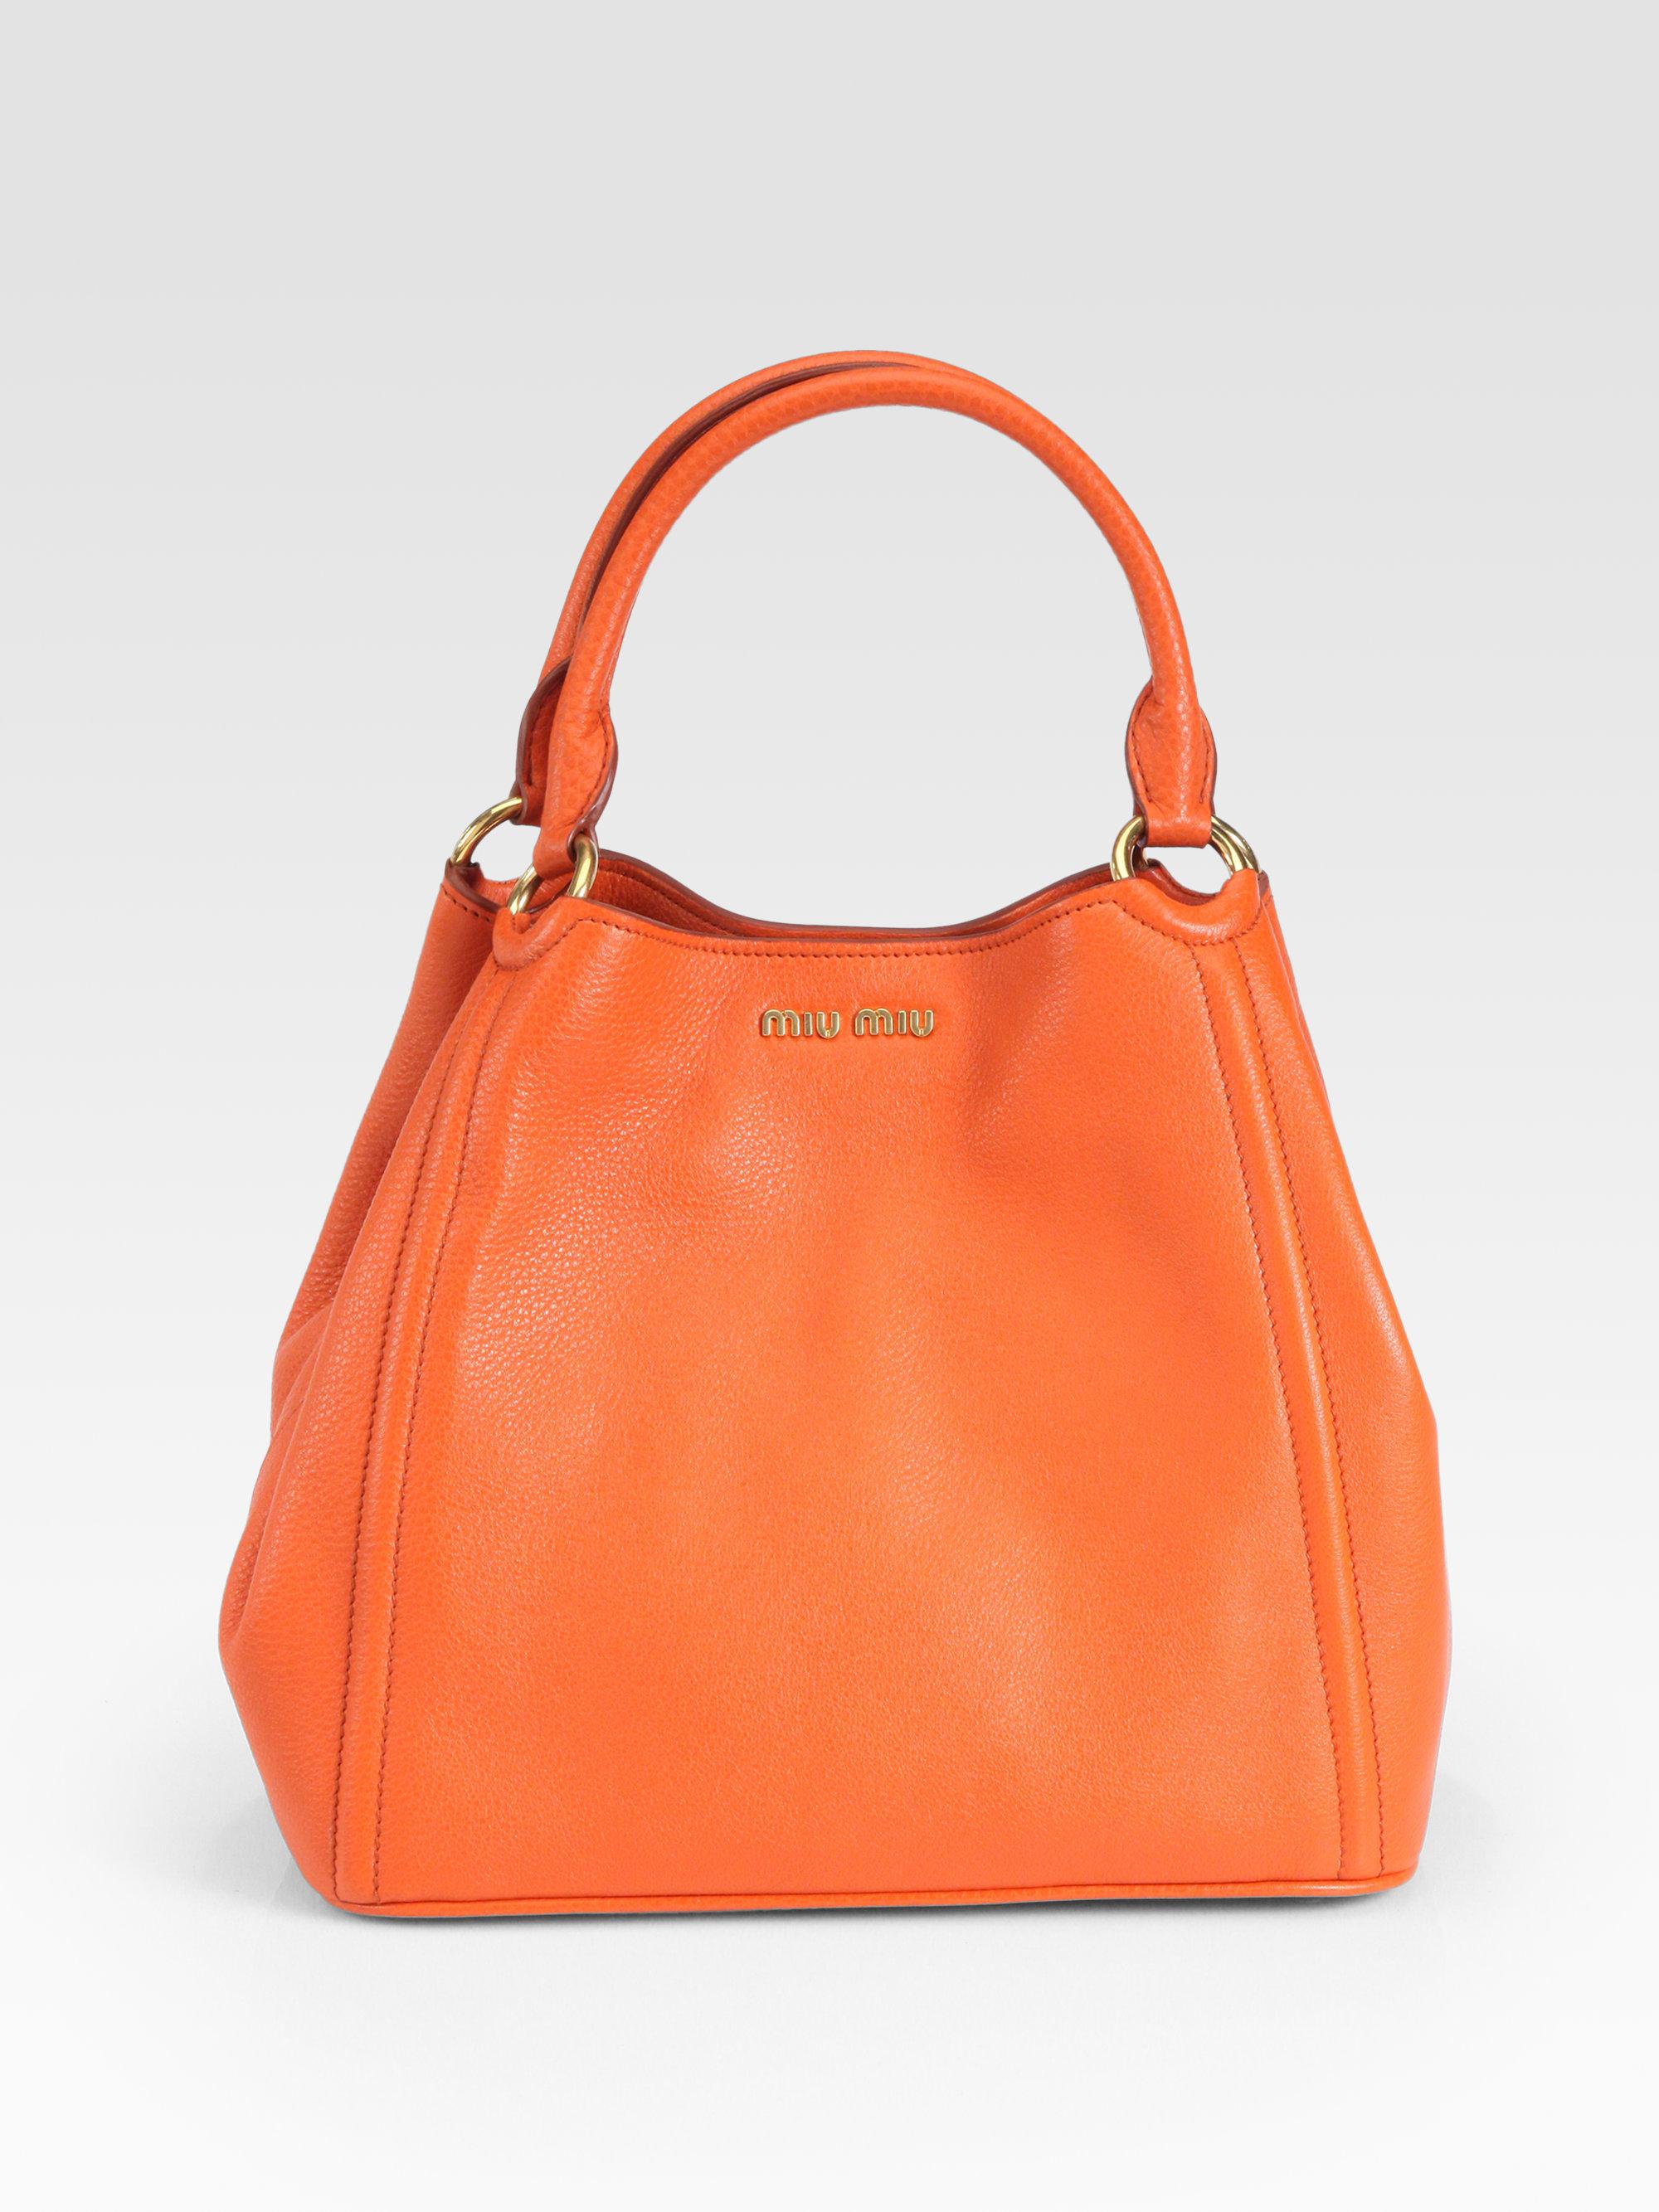 Miu Miu Orange Bag